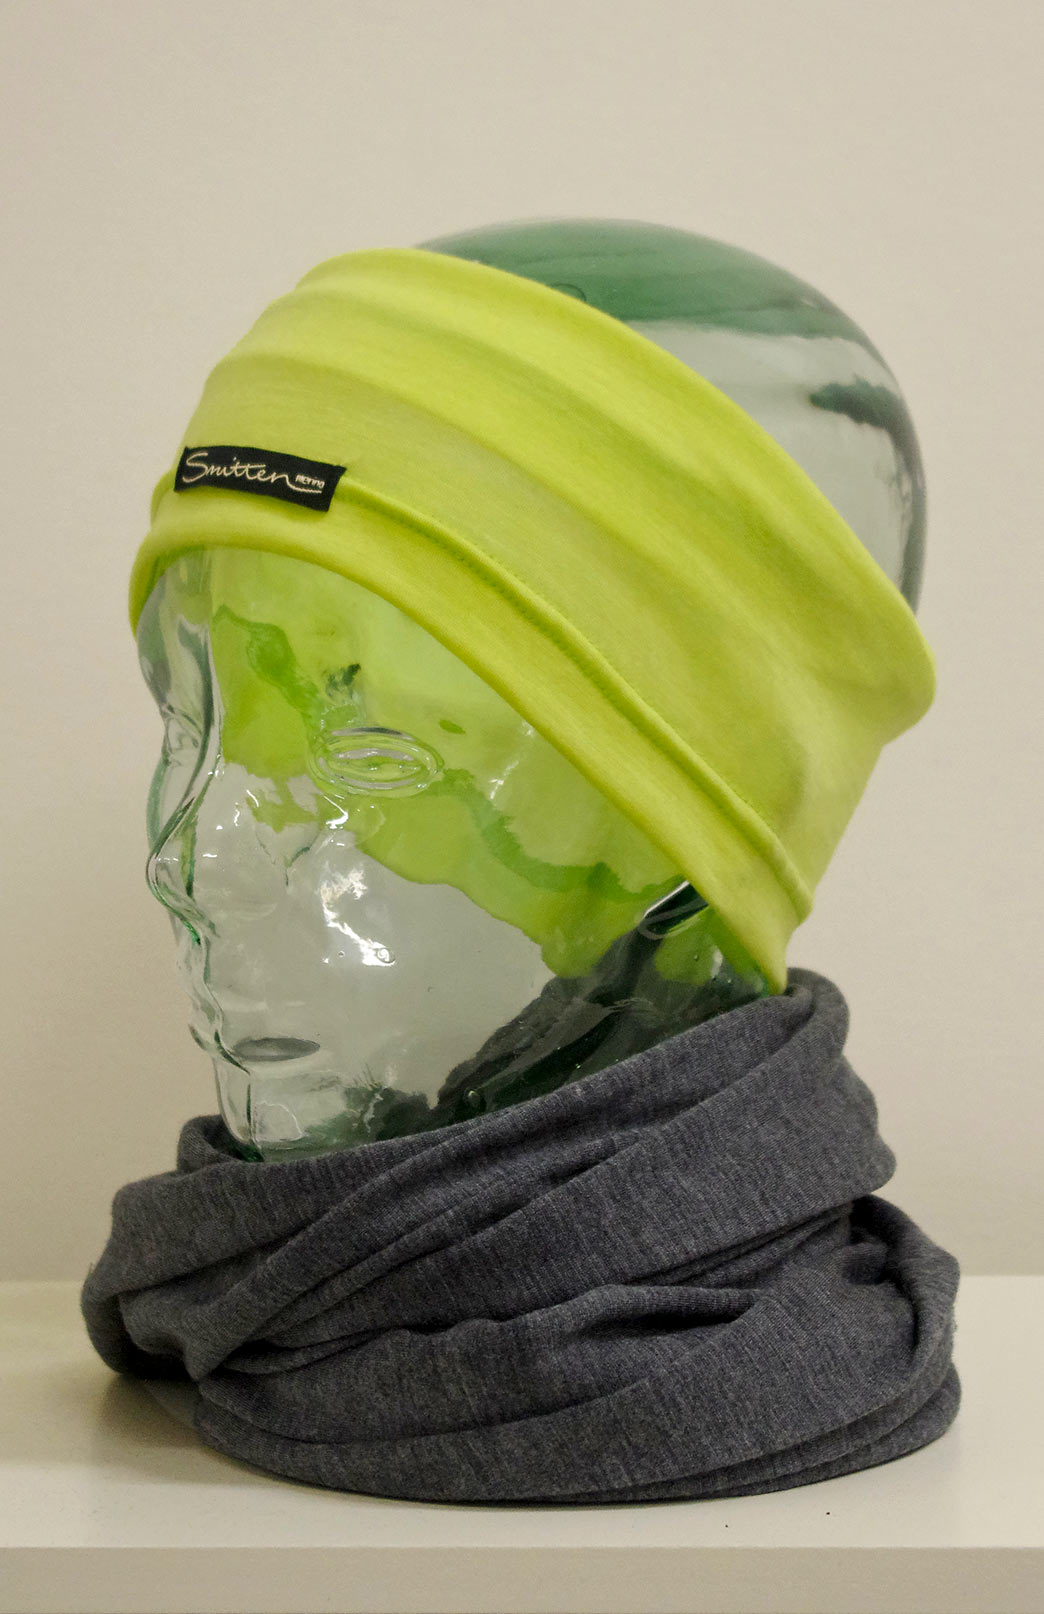 Headband / Ear Warmer - Unisex Chartreuse Lime Merino Wool Headband and Ear Warmer - Smitten Merino Tasmania Australia